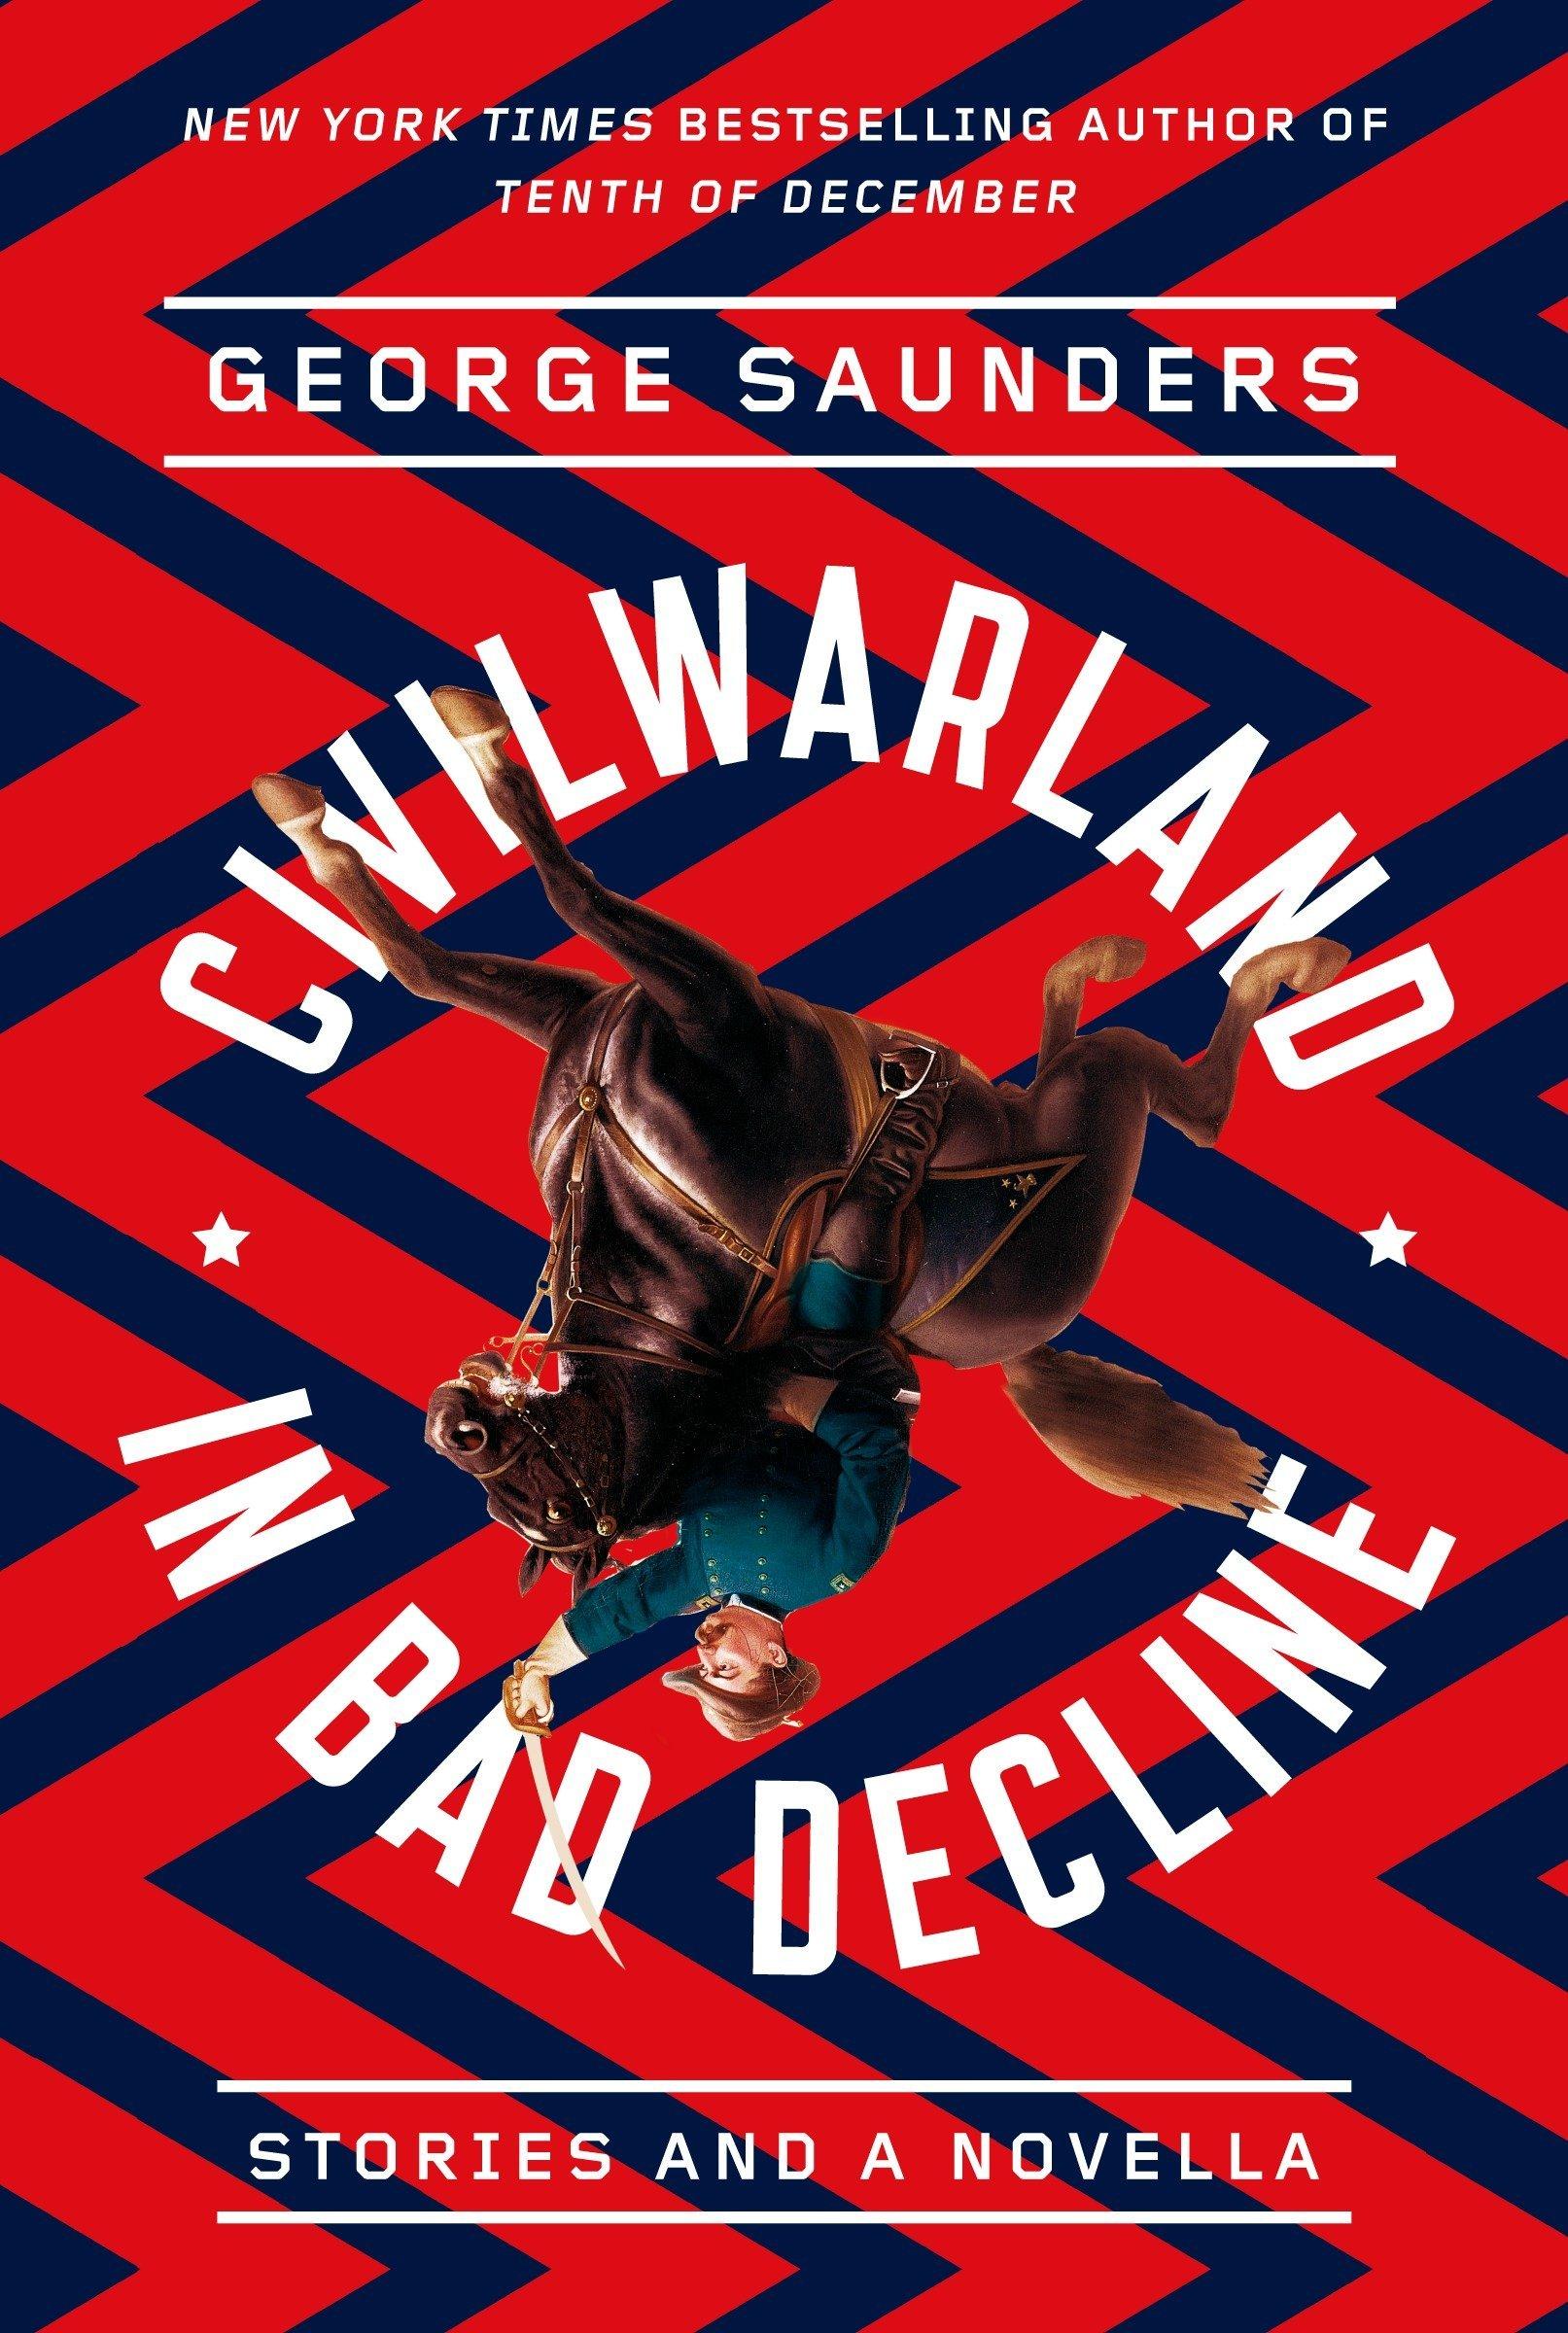 civilwarland in bad decline summary